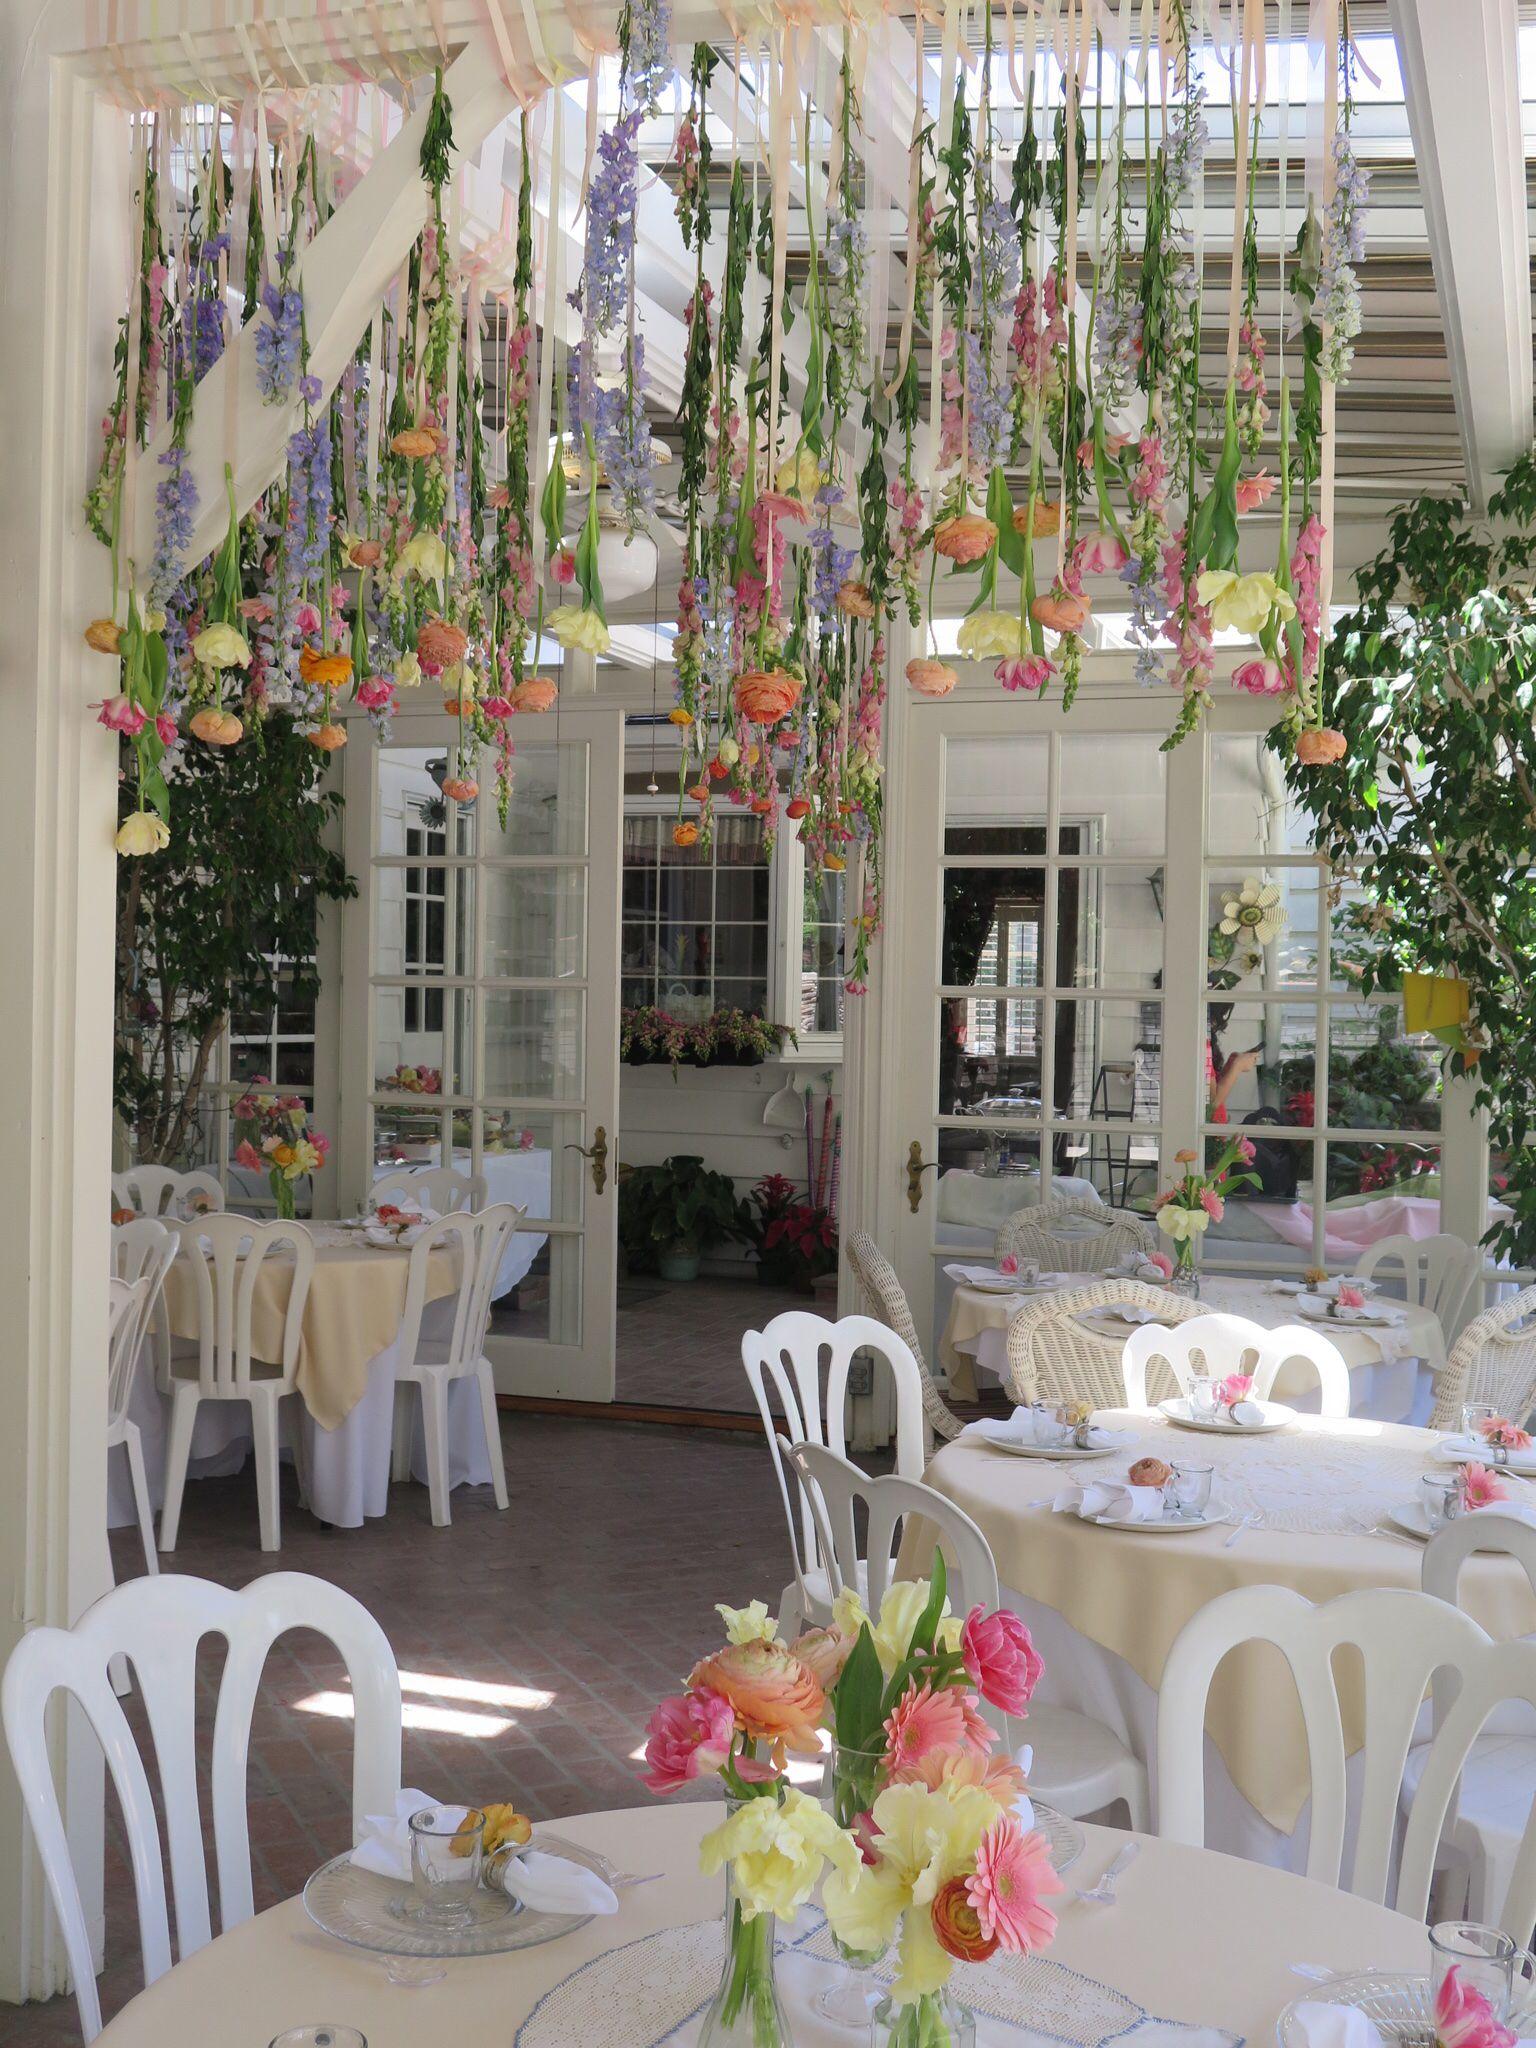 Garden Party - Bridal Shower - Hanging Flowers | Bridal ...